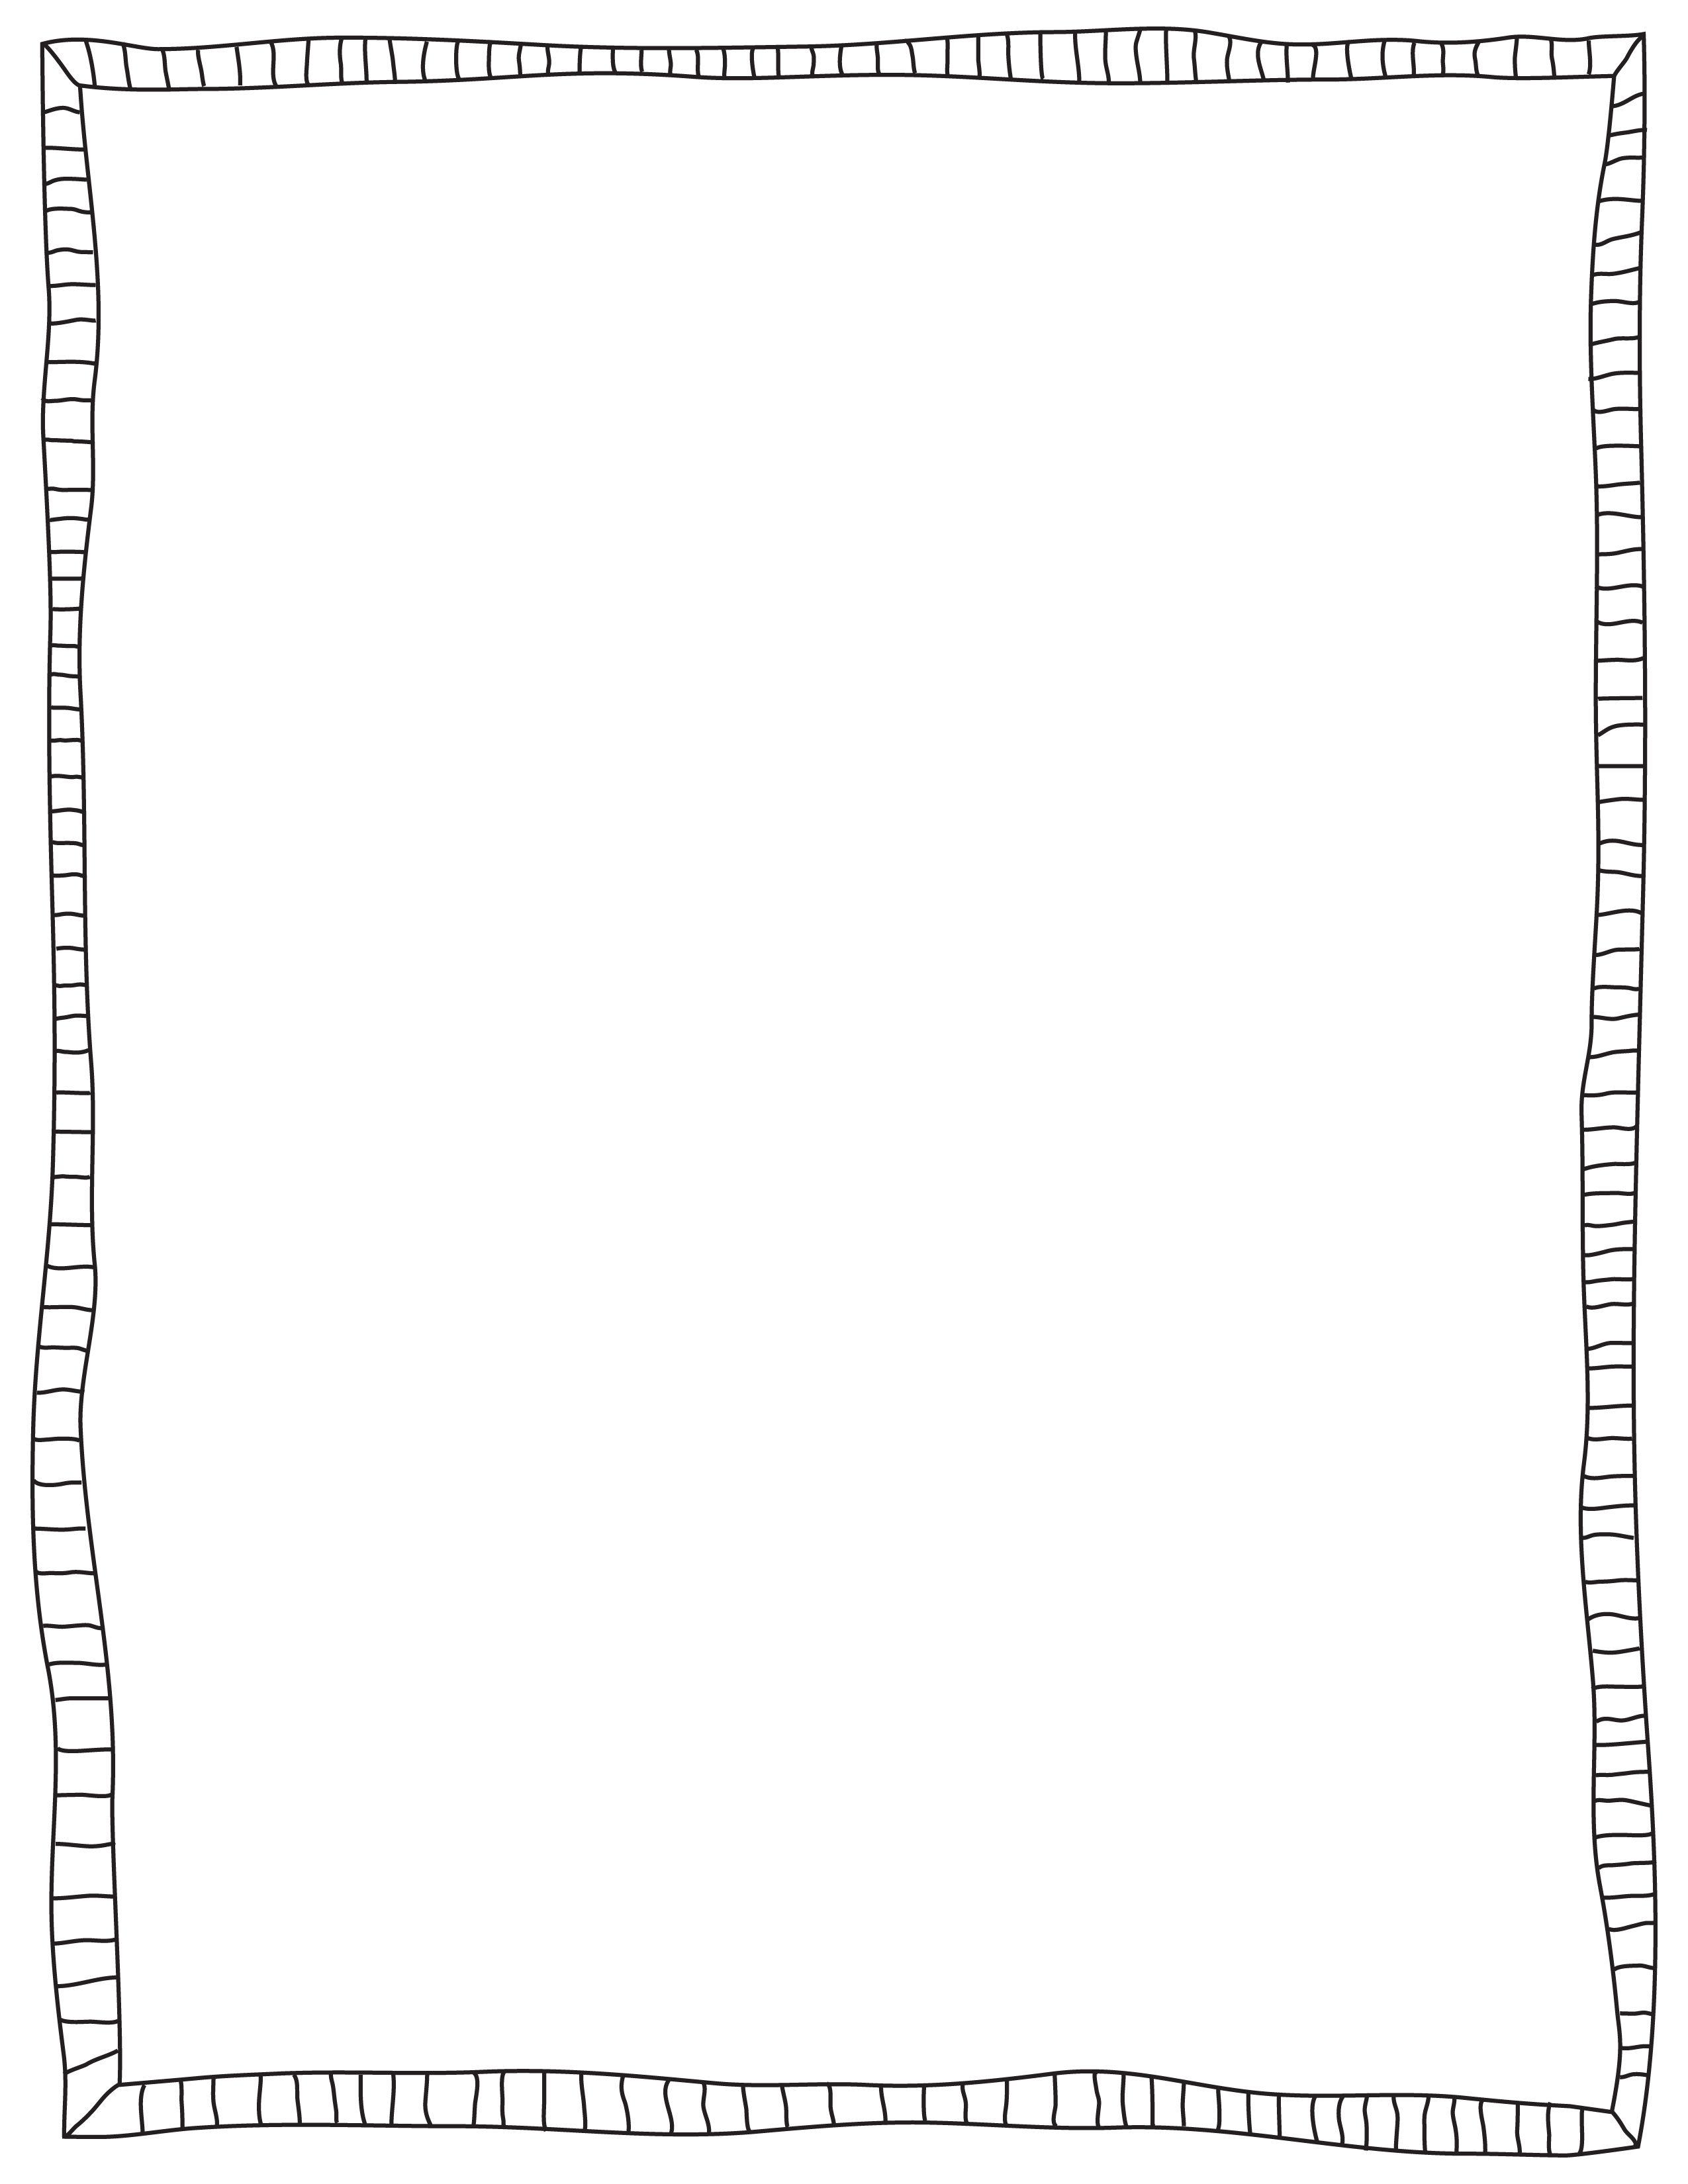 Frames borders clip art. Boarder clipart doodle